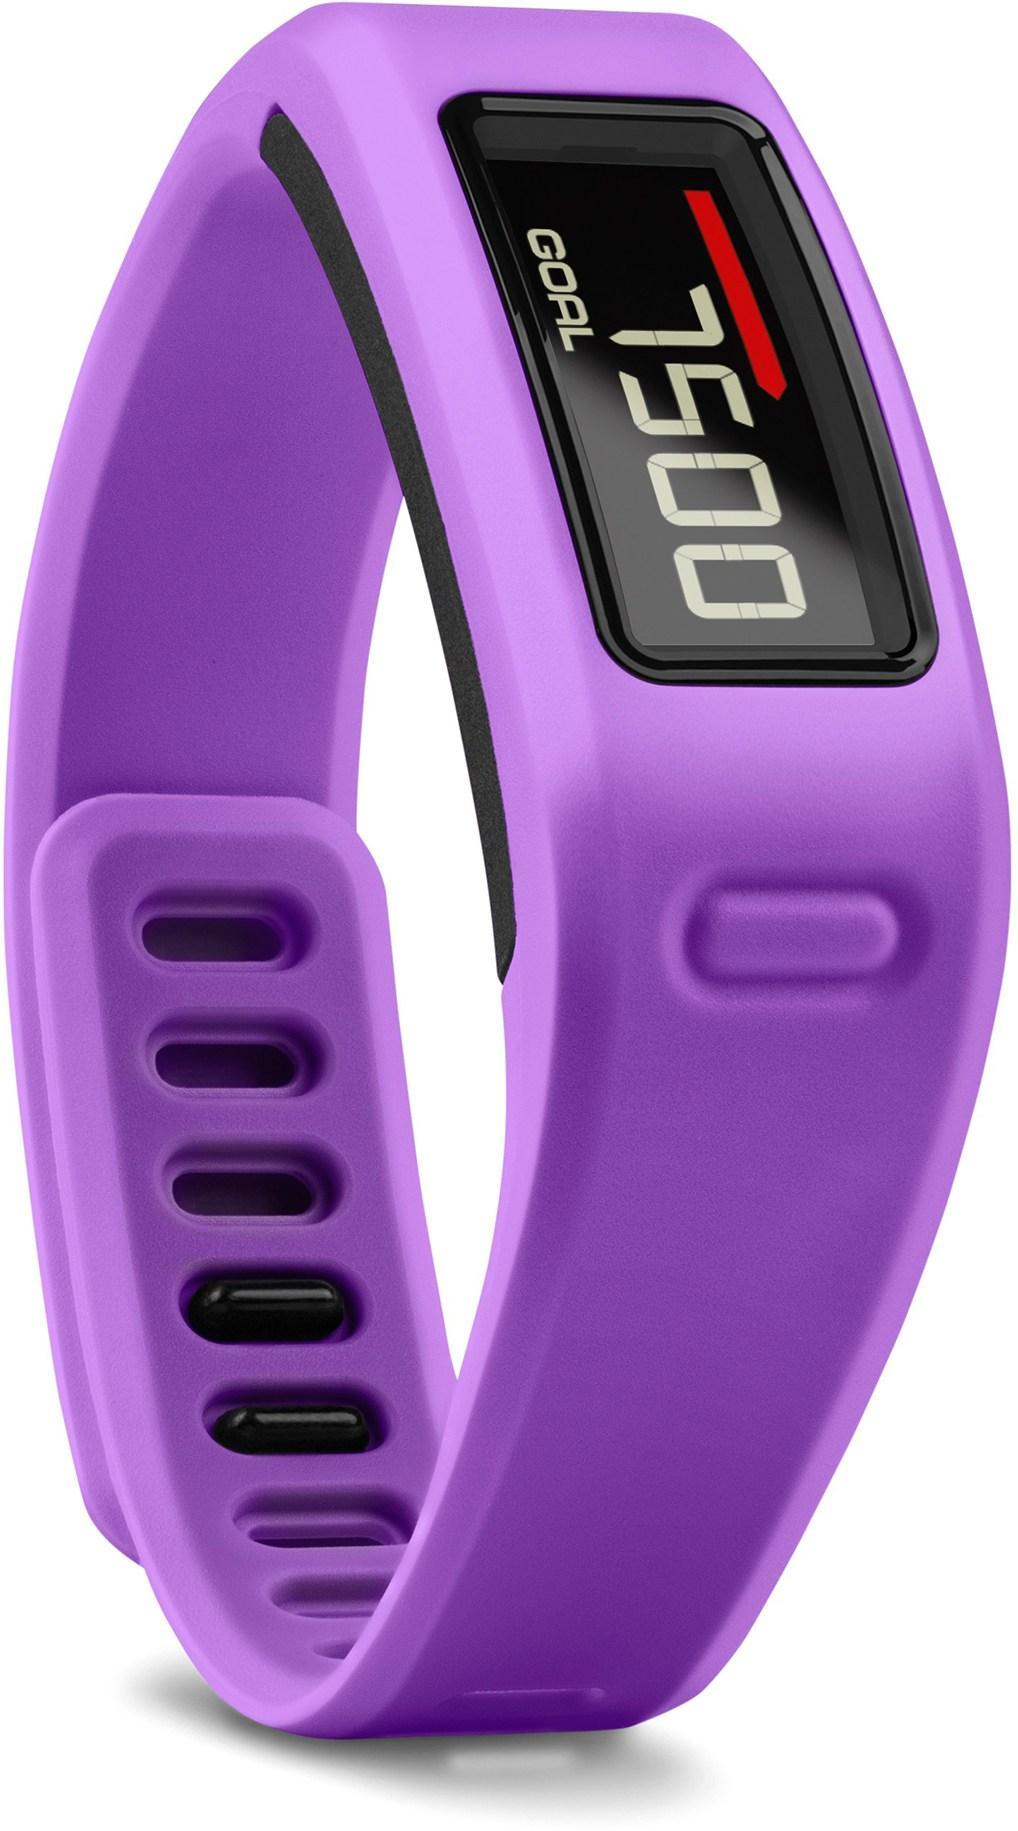 Garmin vivofit Wireless Activity Tracker Fitness gadgets